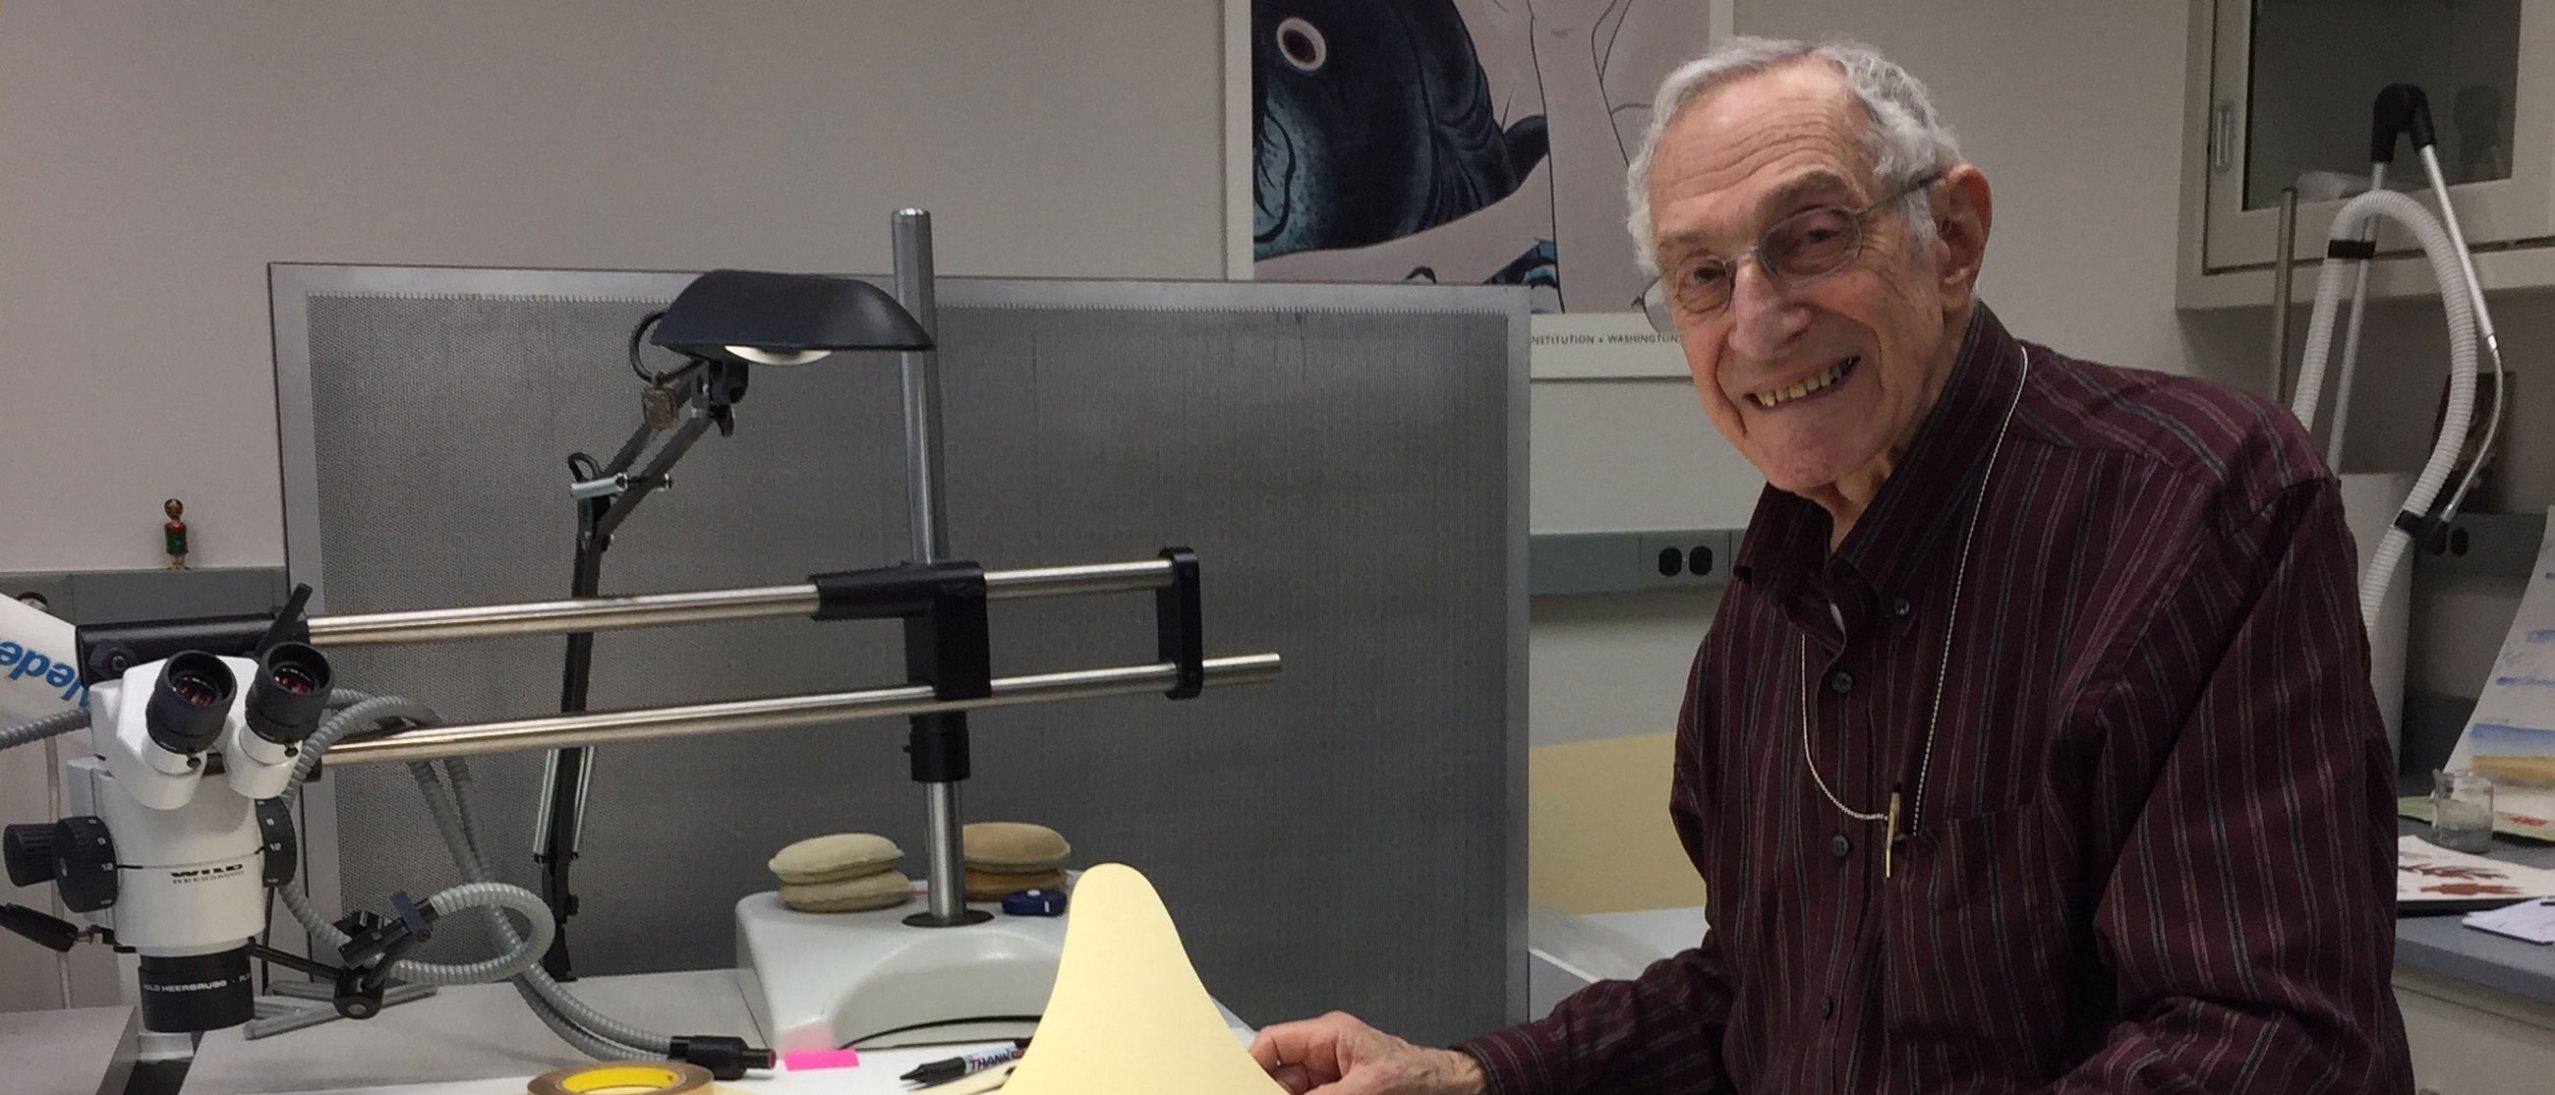 Larry Devore, Freer Sackler volunteer